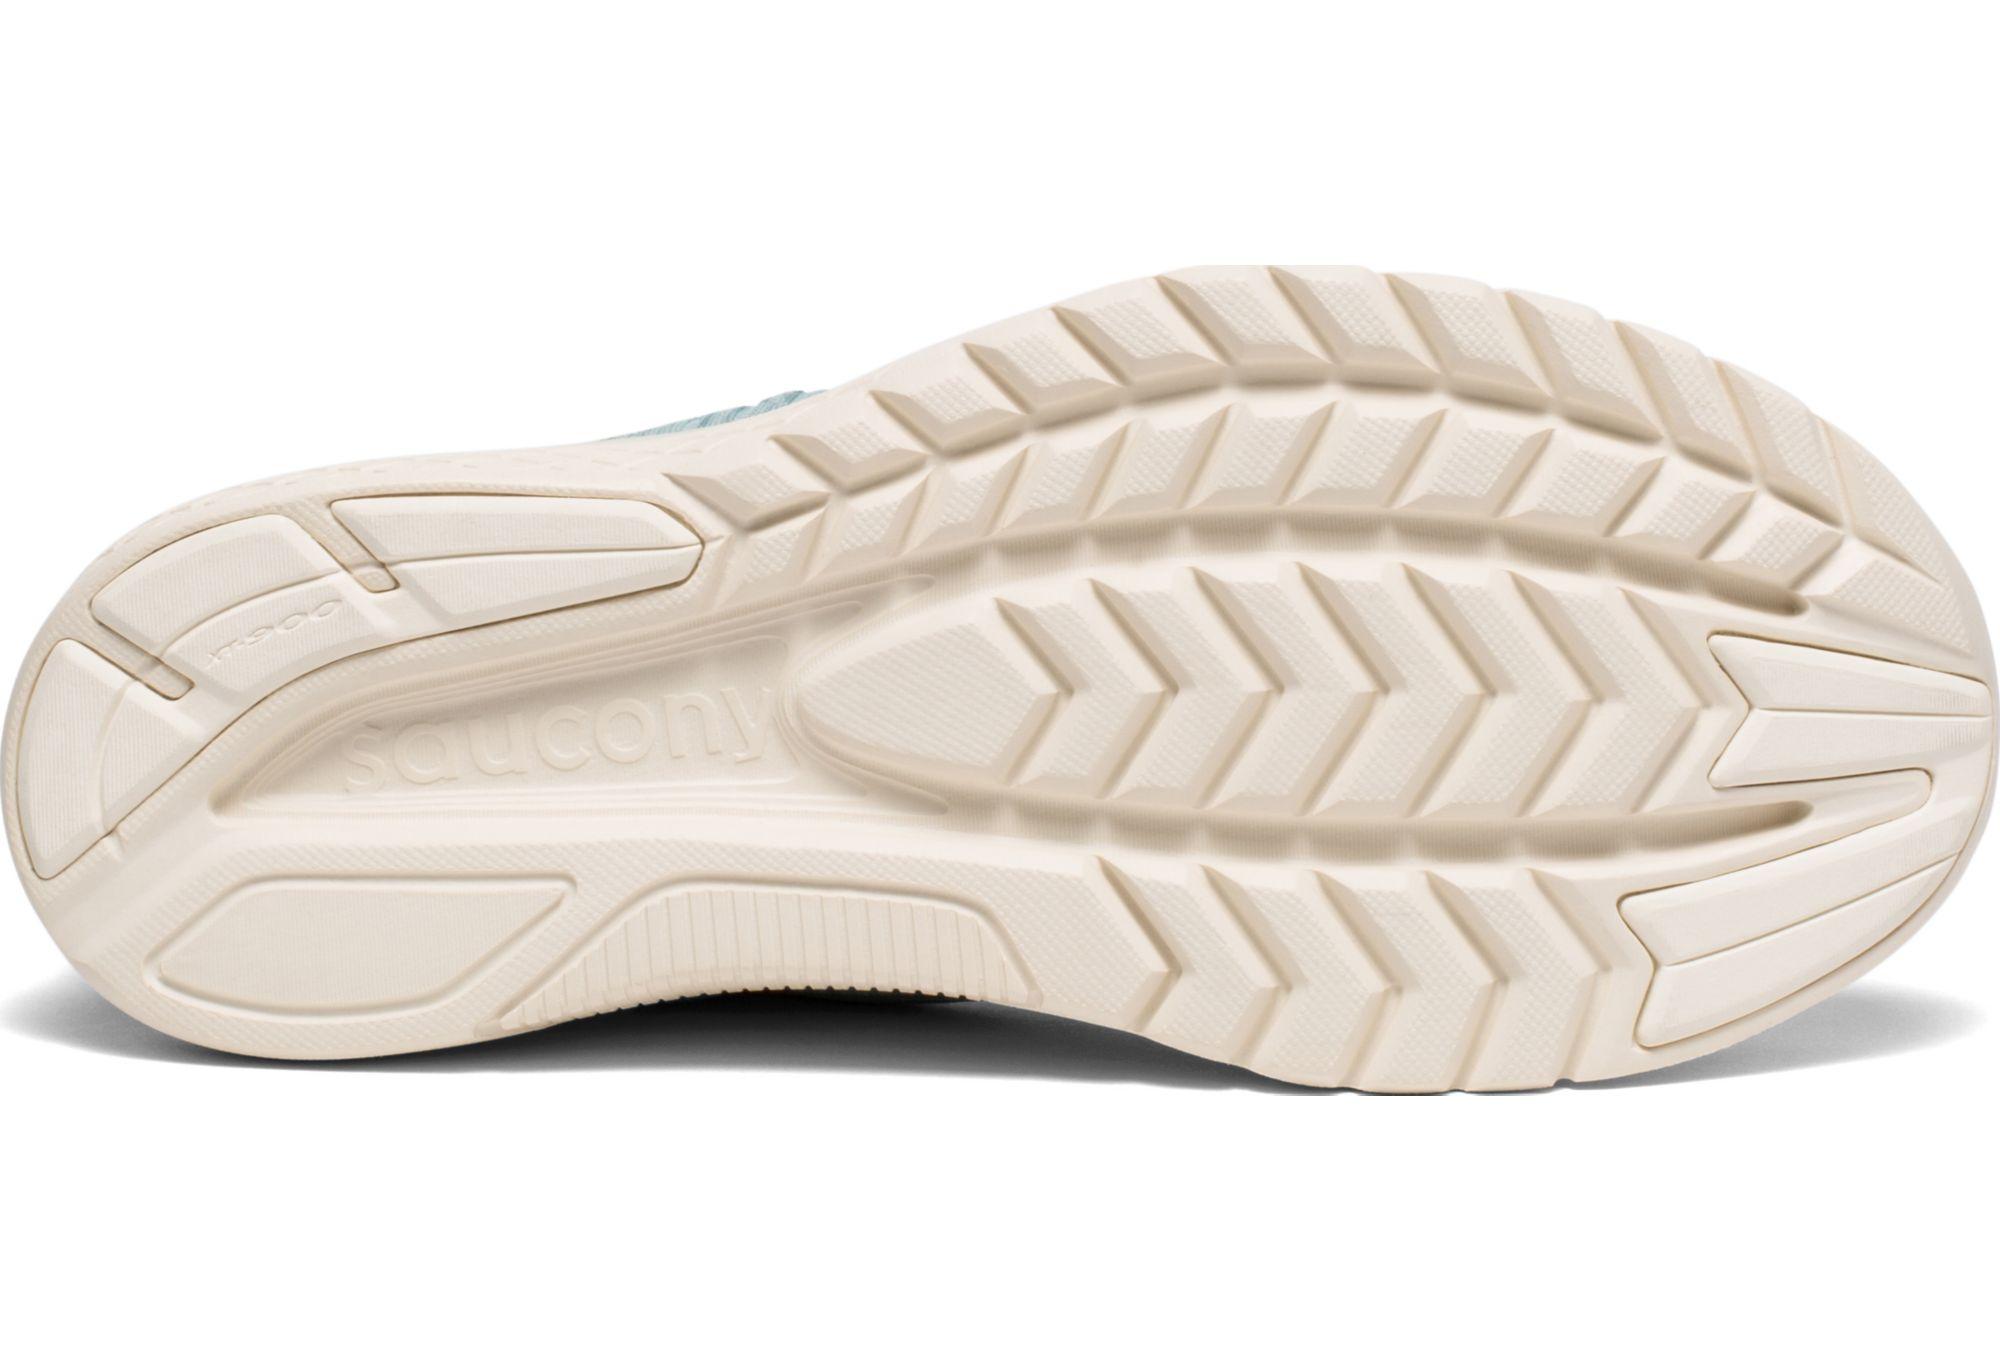 Zapatillas para correr Saucony Kinvara 10 Aqua Shade